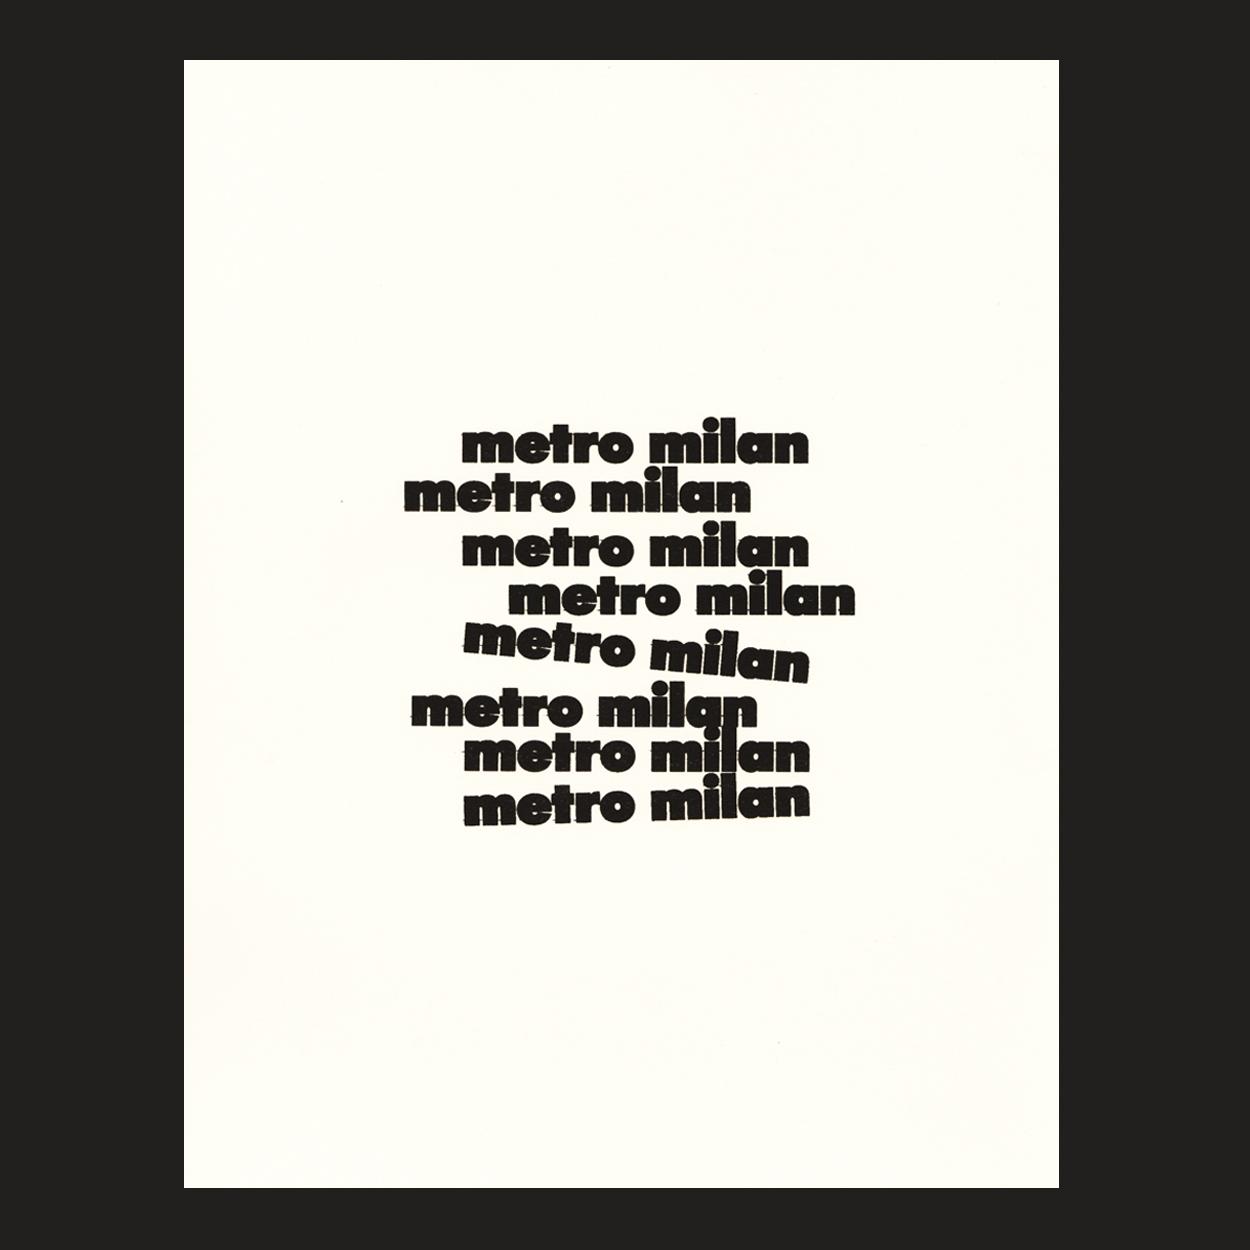 the-editorial-metro-milan9